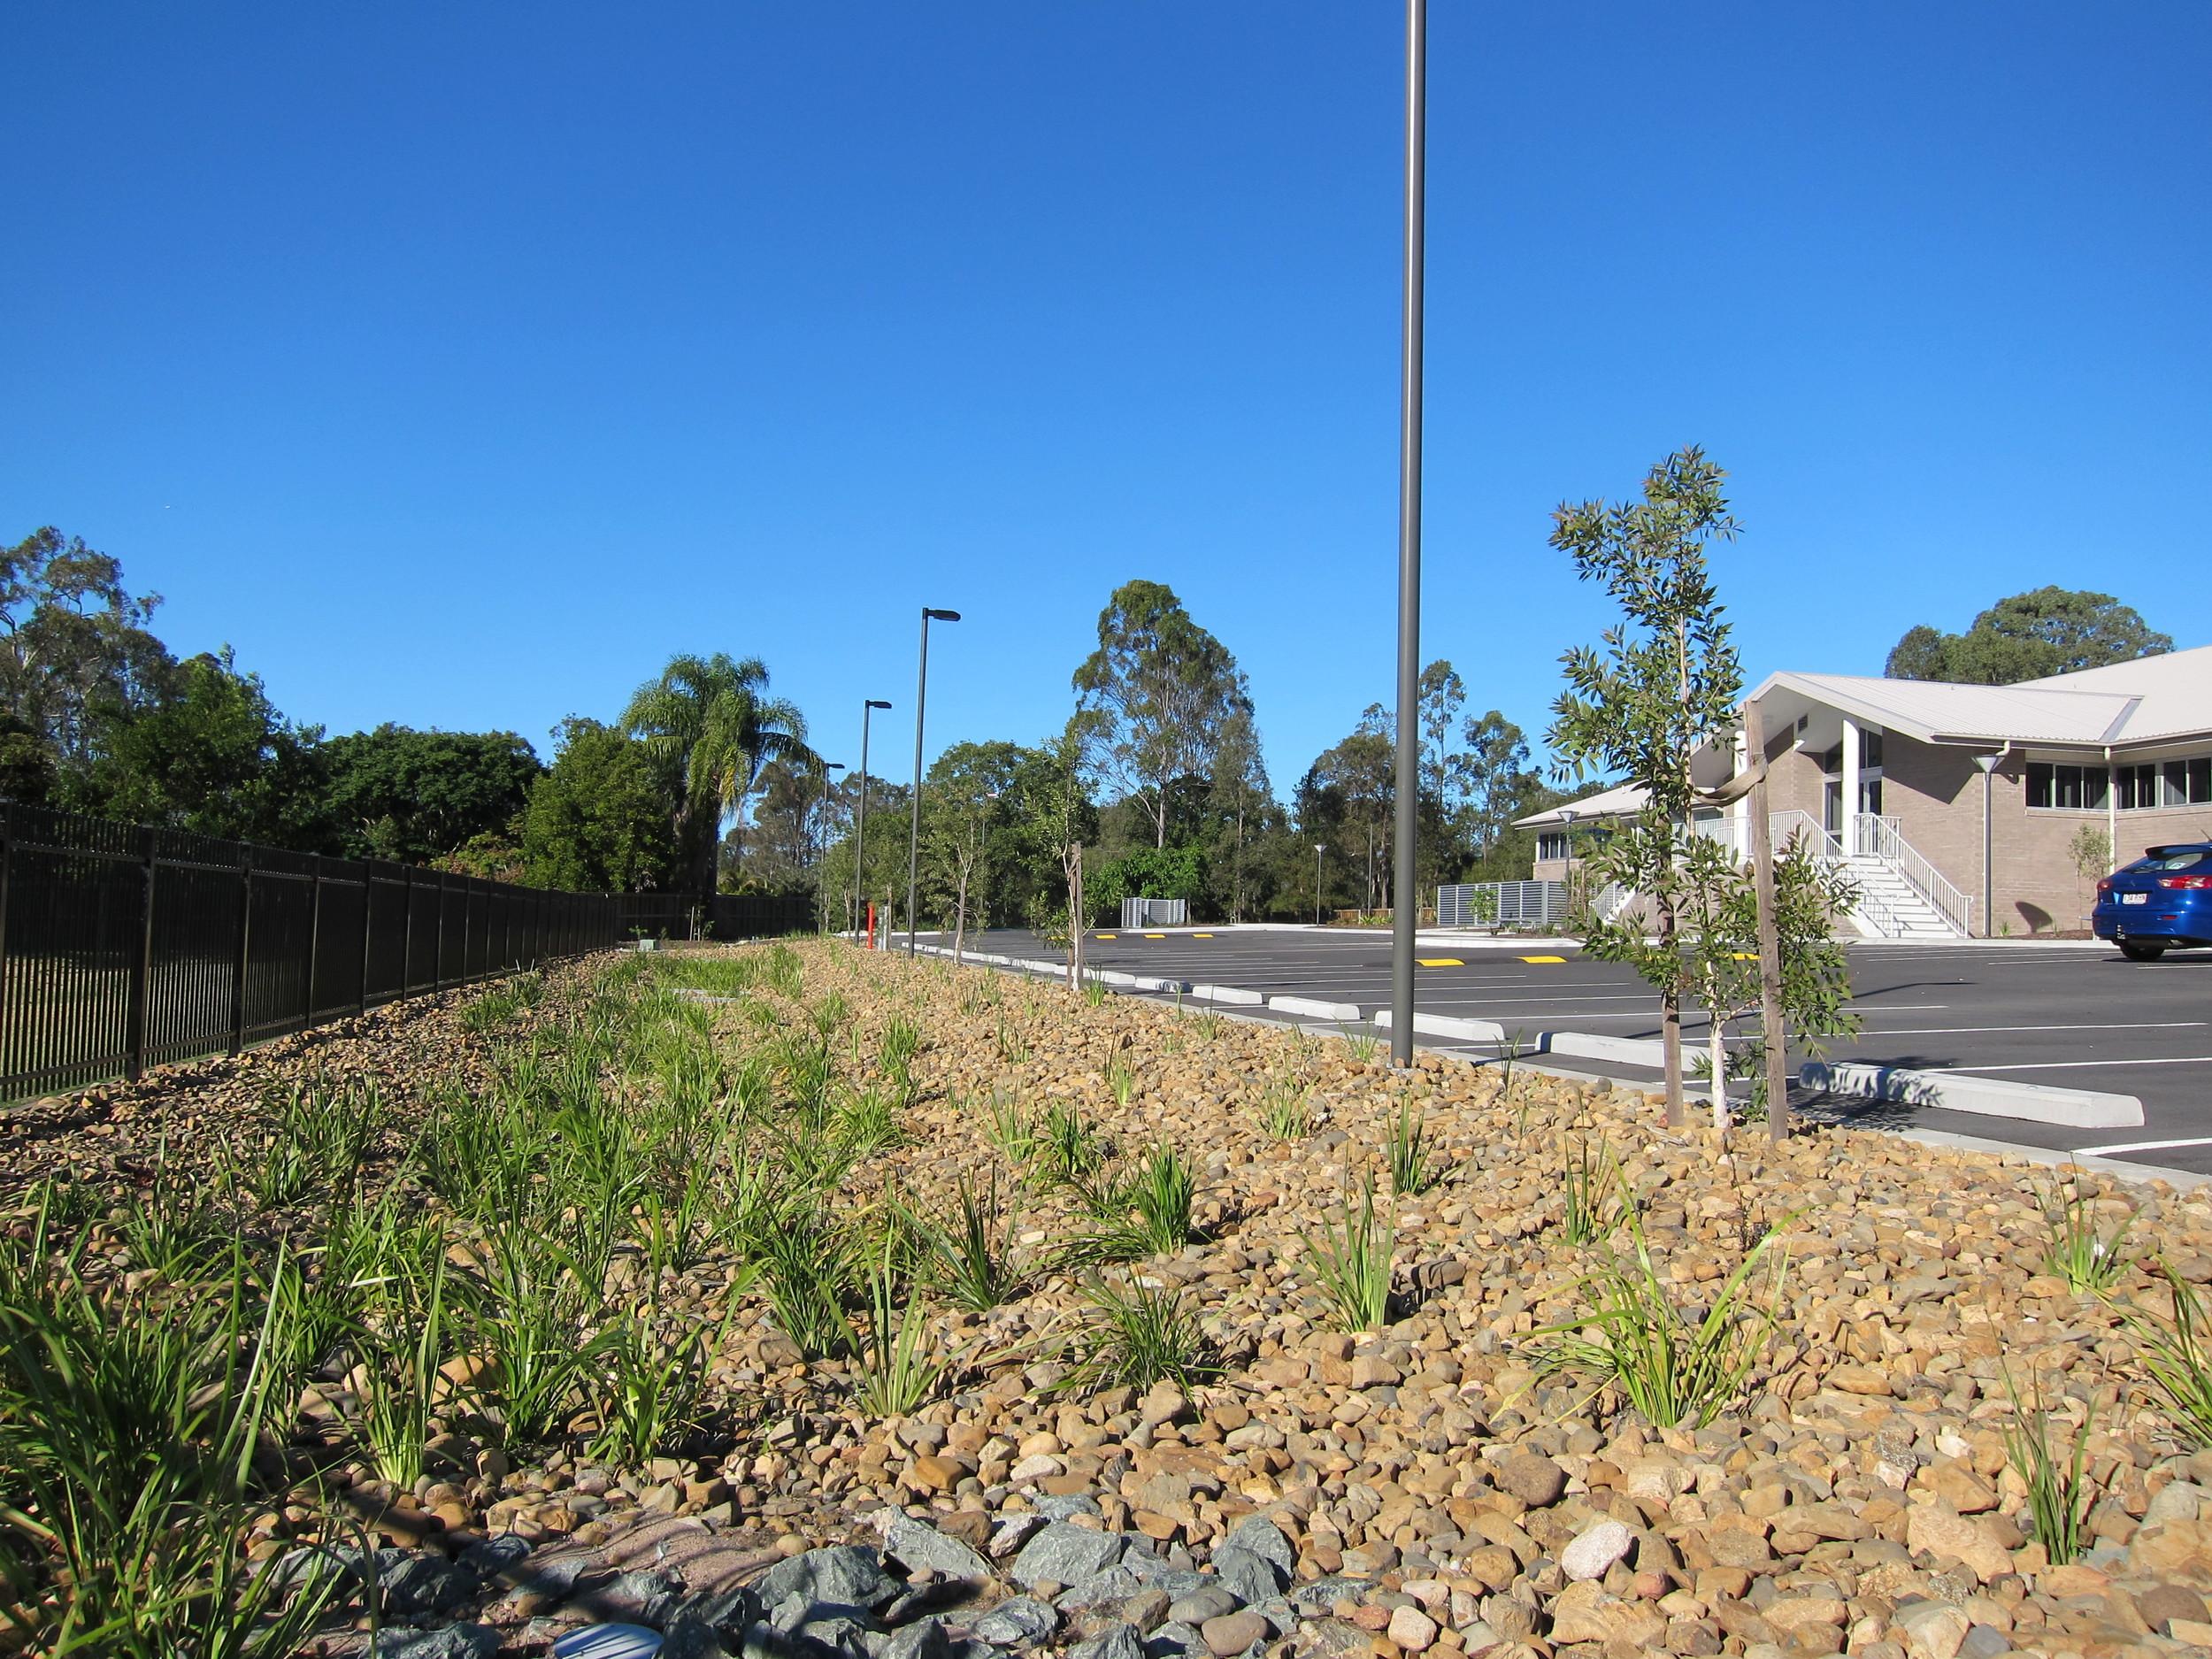 Johnson Rd Bioretention